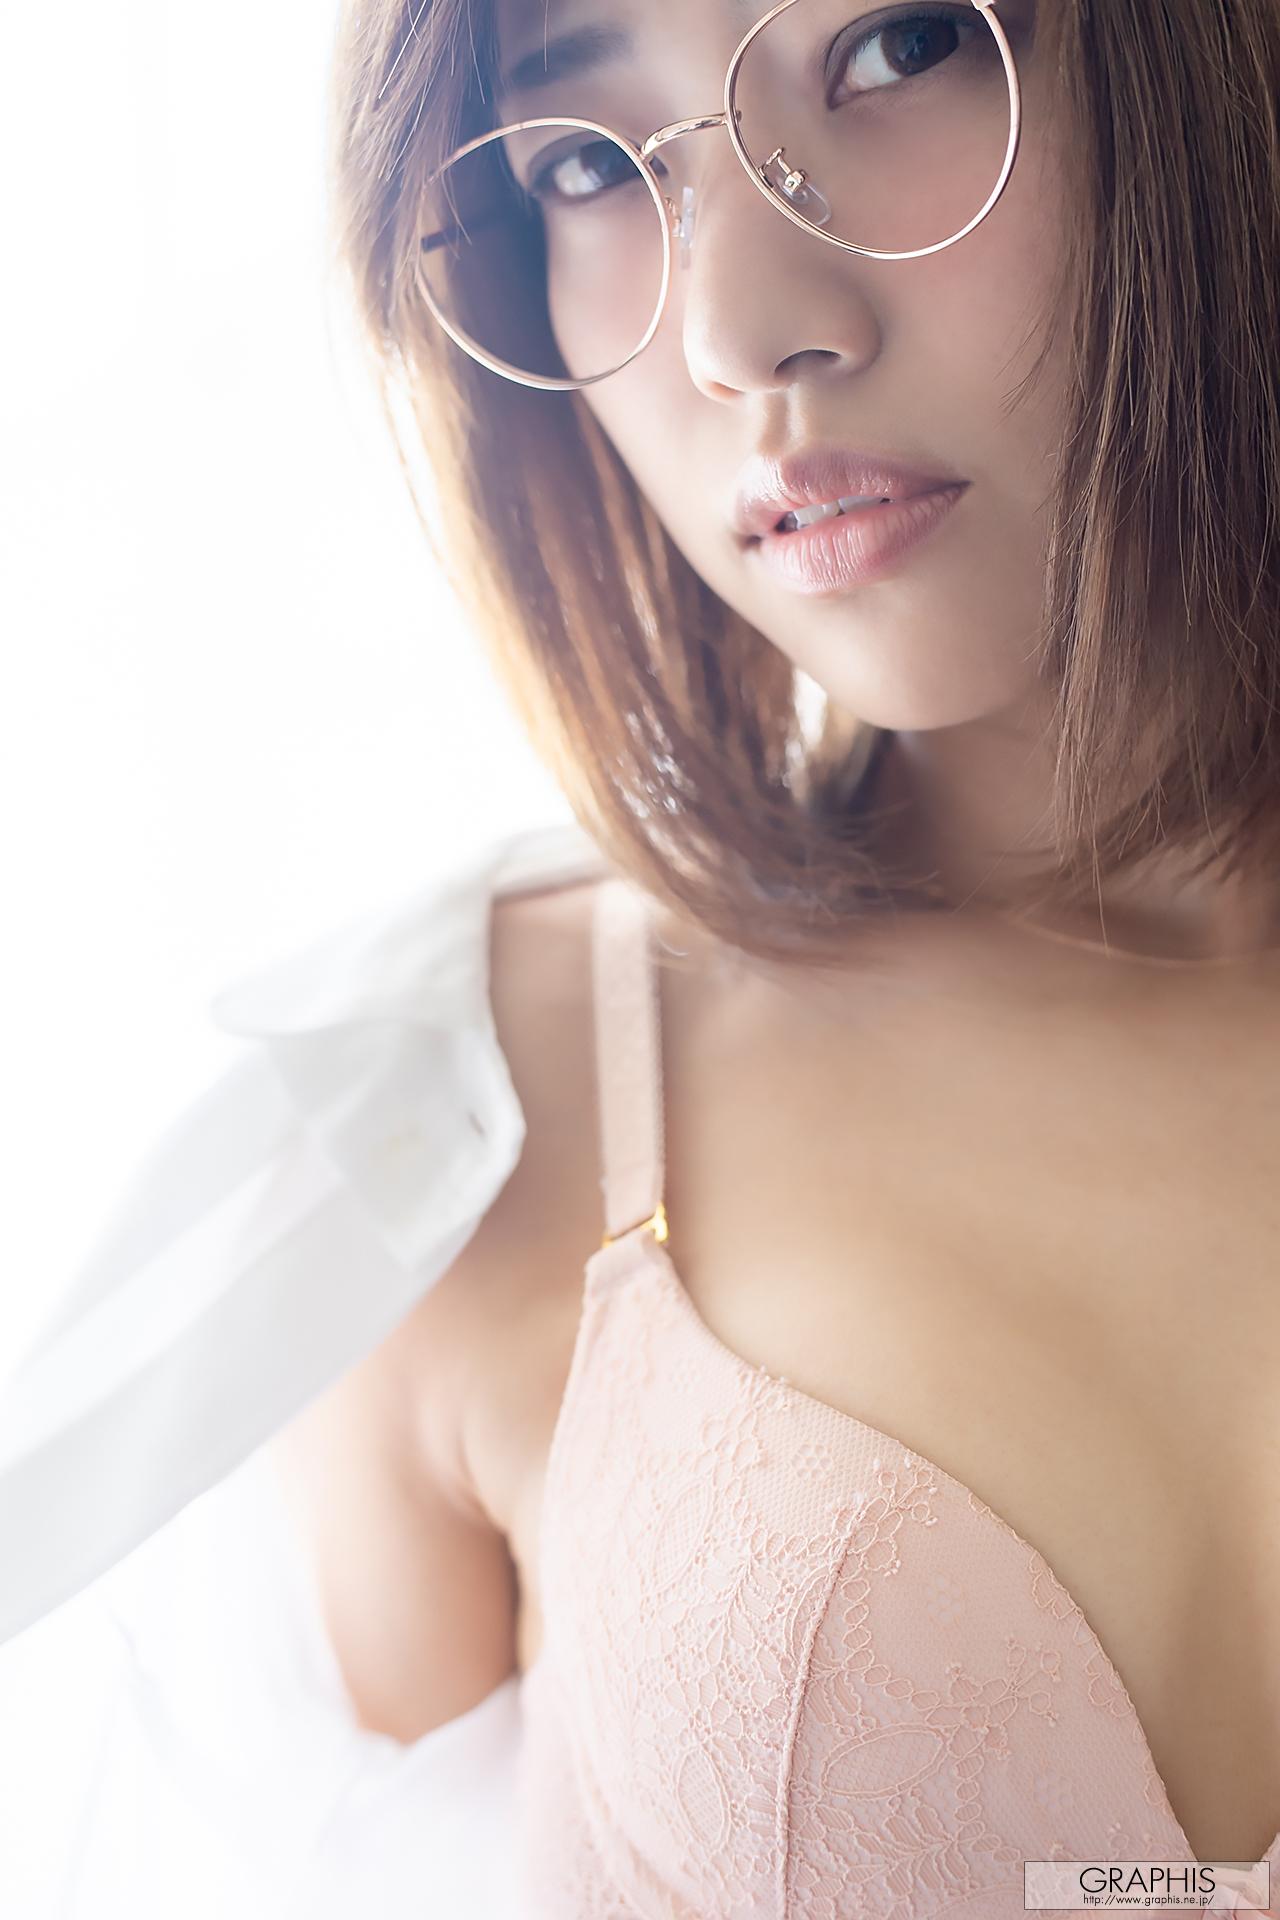 People 1280x1920 Japanese women Japanese women Asian gravure graphis Masami Ichikawa pornstar JAV Idol